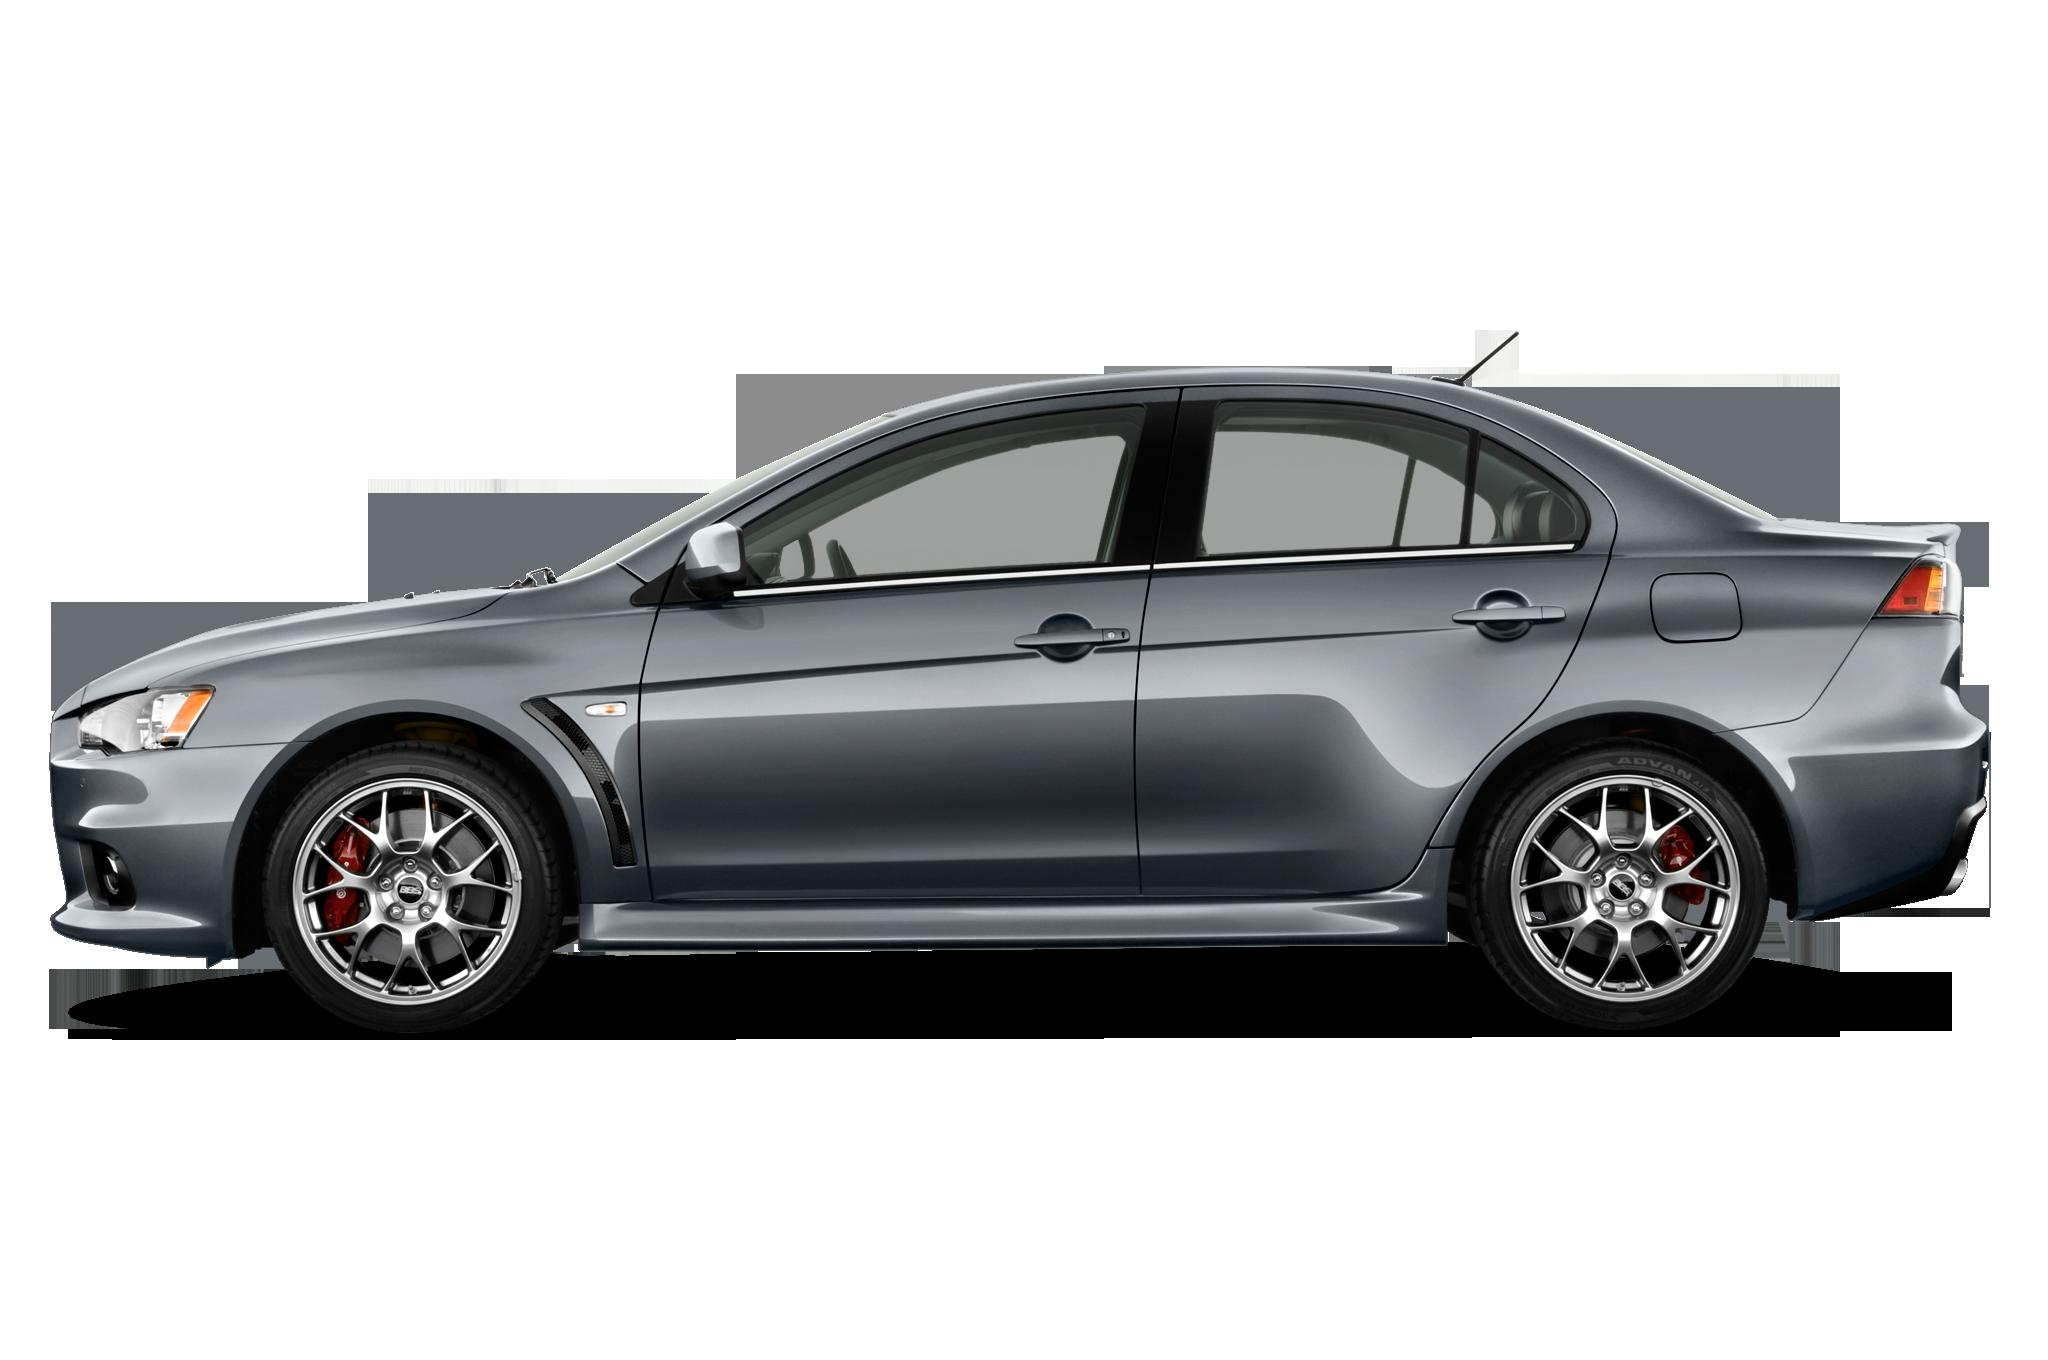 2015 Mitsubishi Lancer Updated Gains Newer Cvt Automobile Magazine. Mitsubishi. 2005 Mitsubishi Lancer Evolution Transmission Diagram At Scoala.co